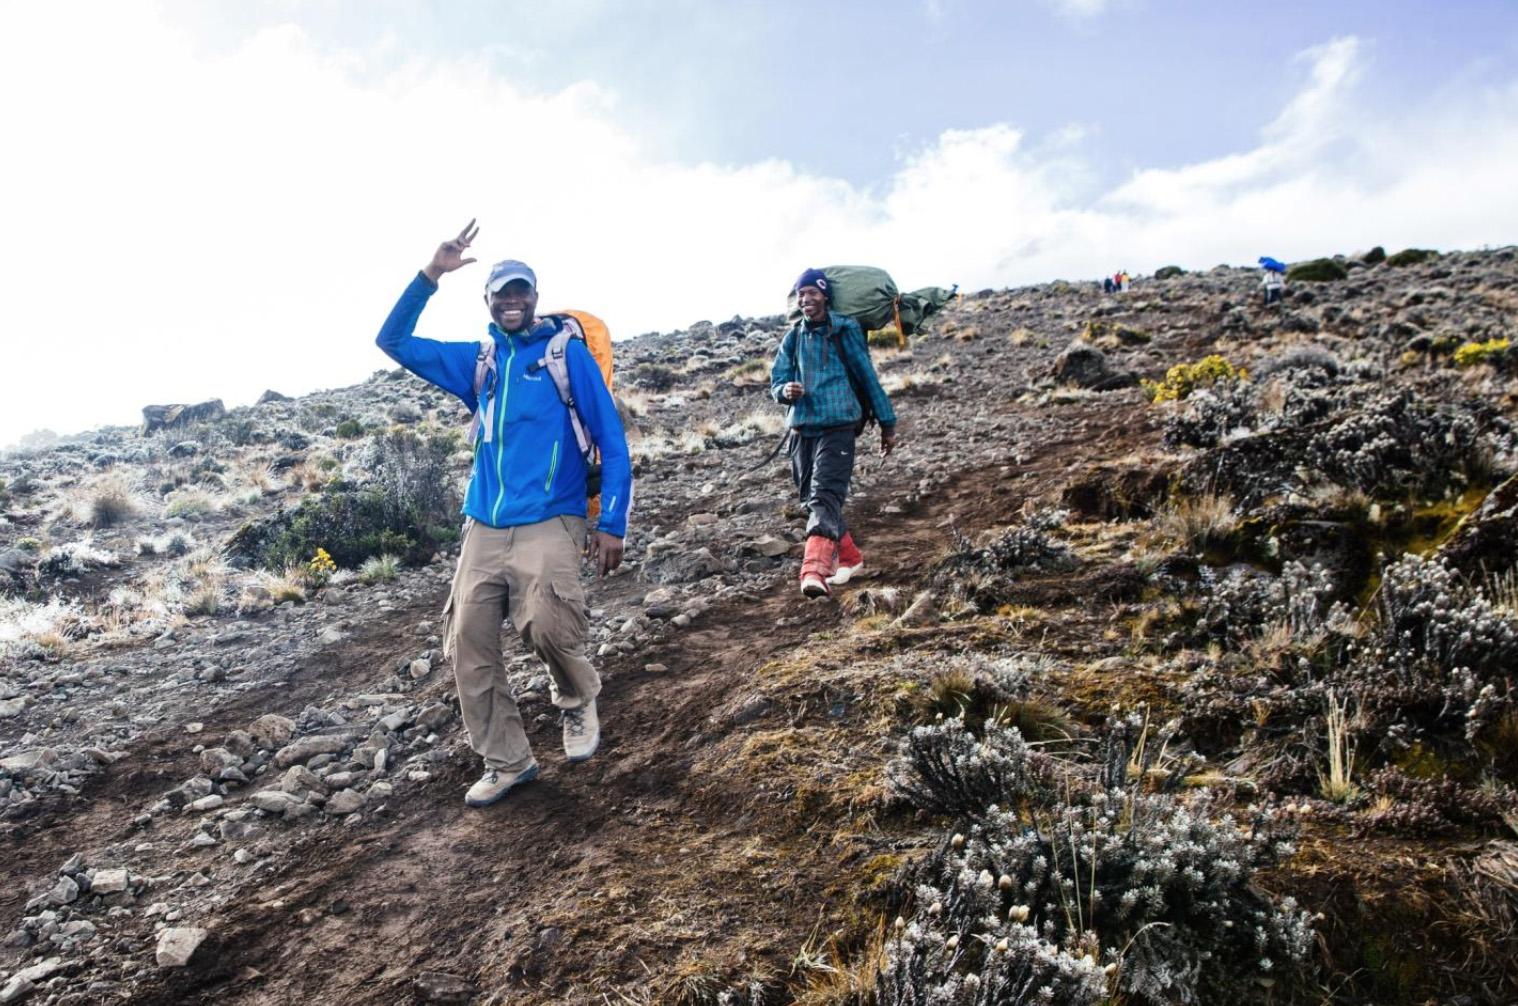 Mount Kilimanjaro tour operator software